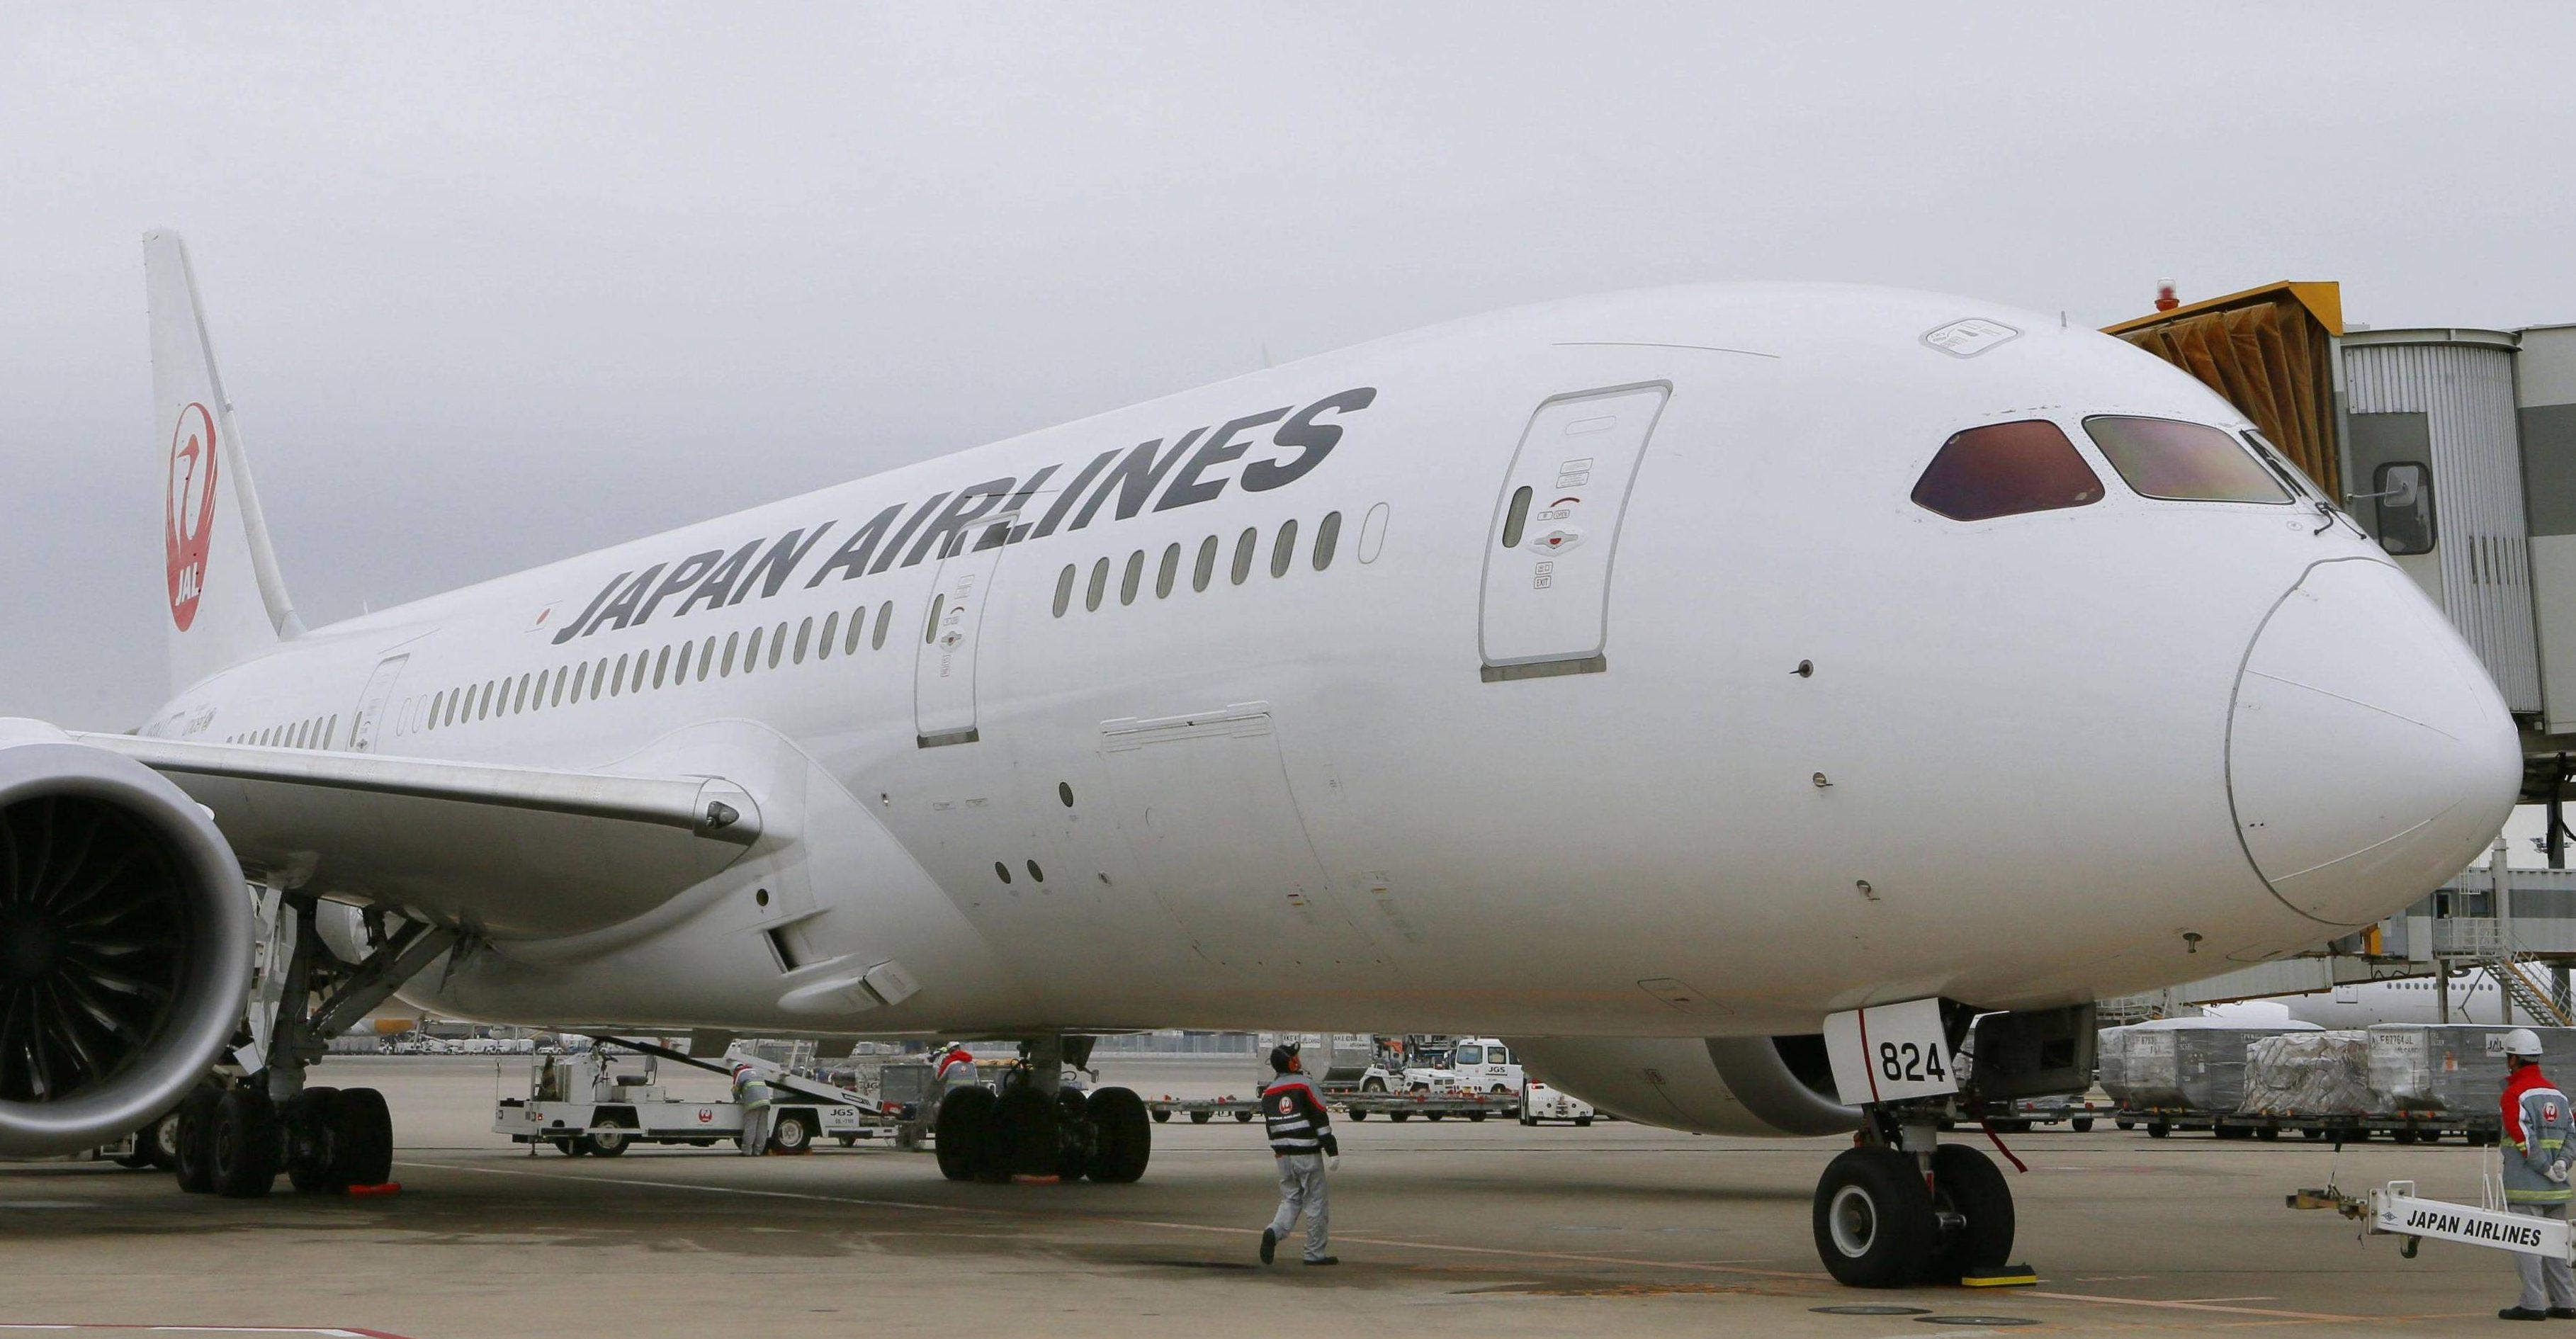 A flight to Japan